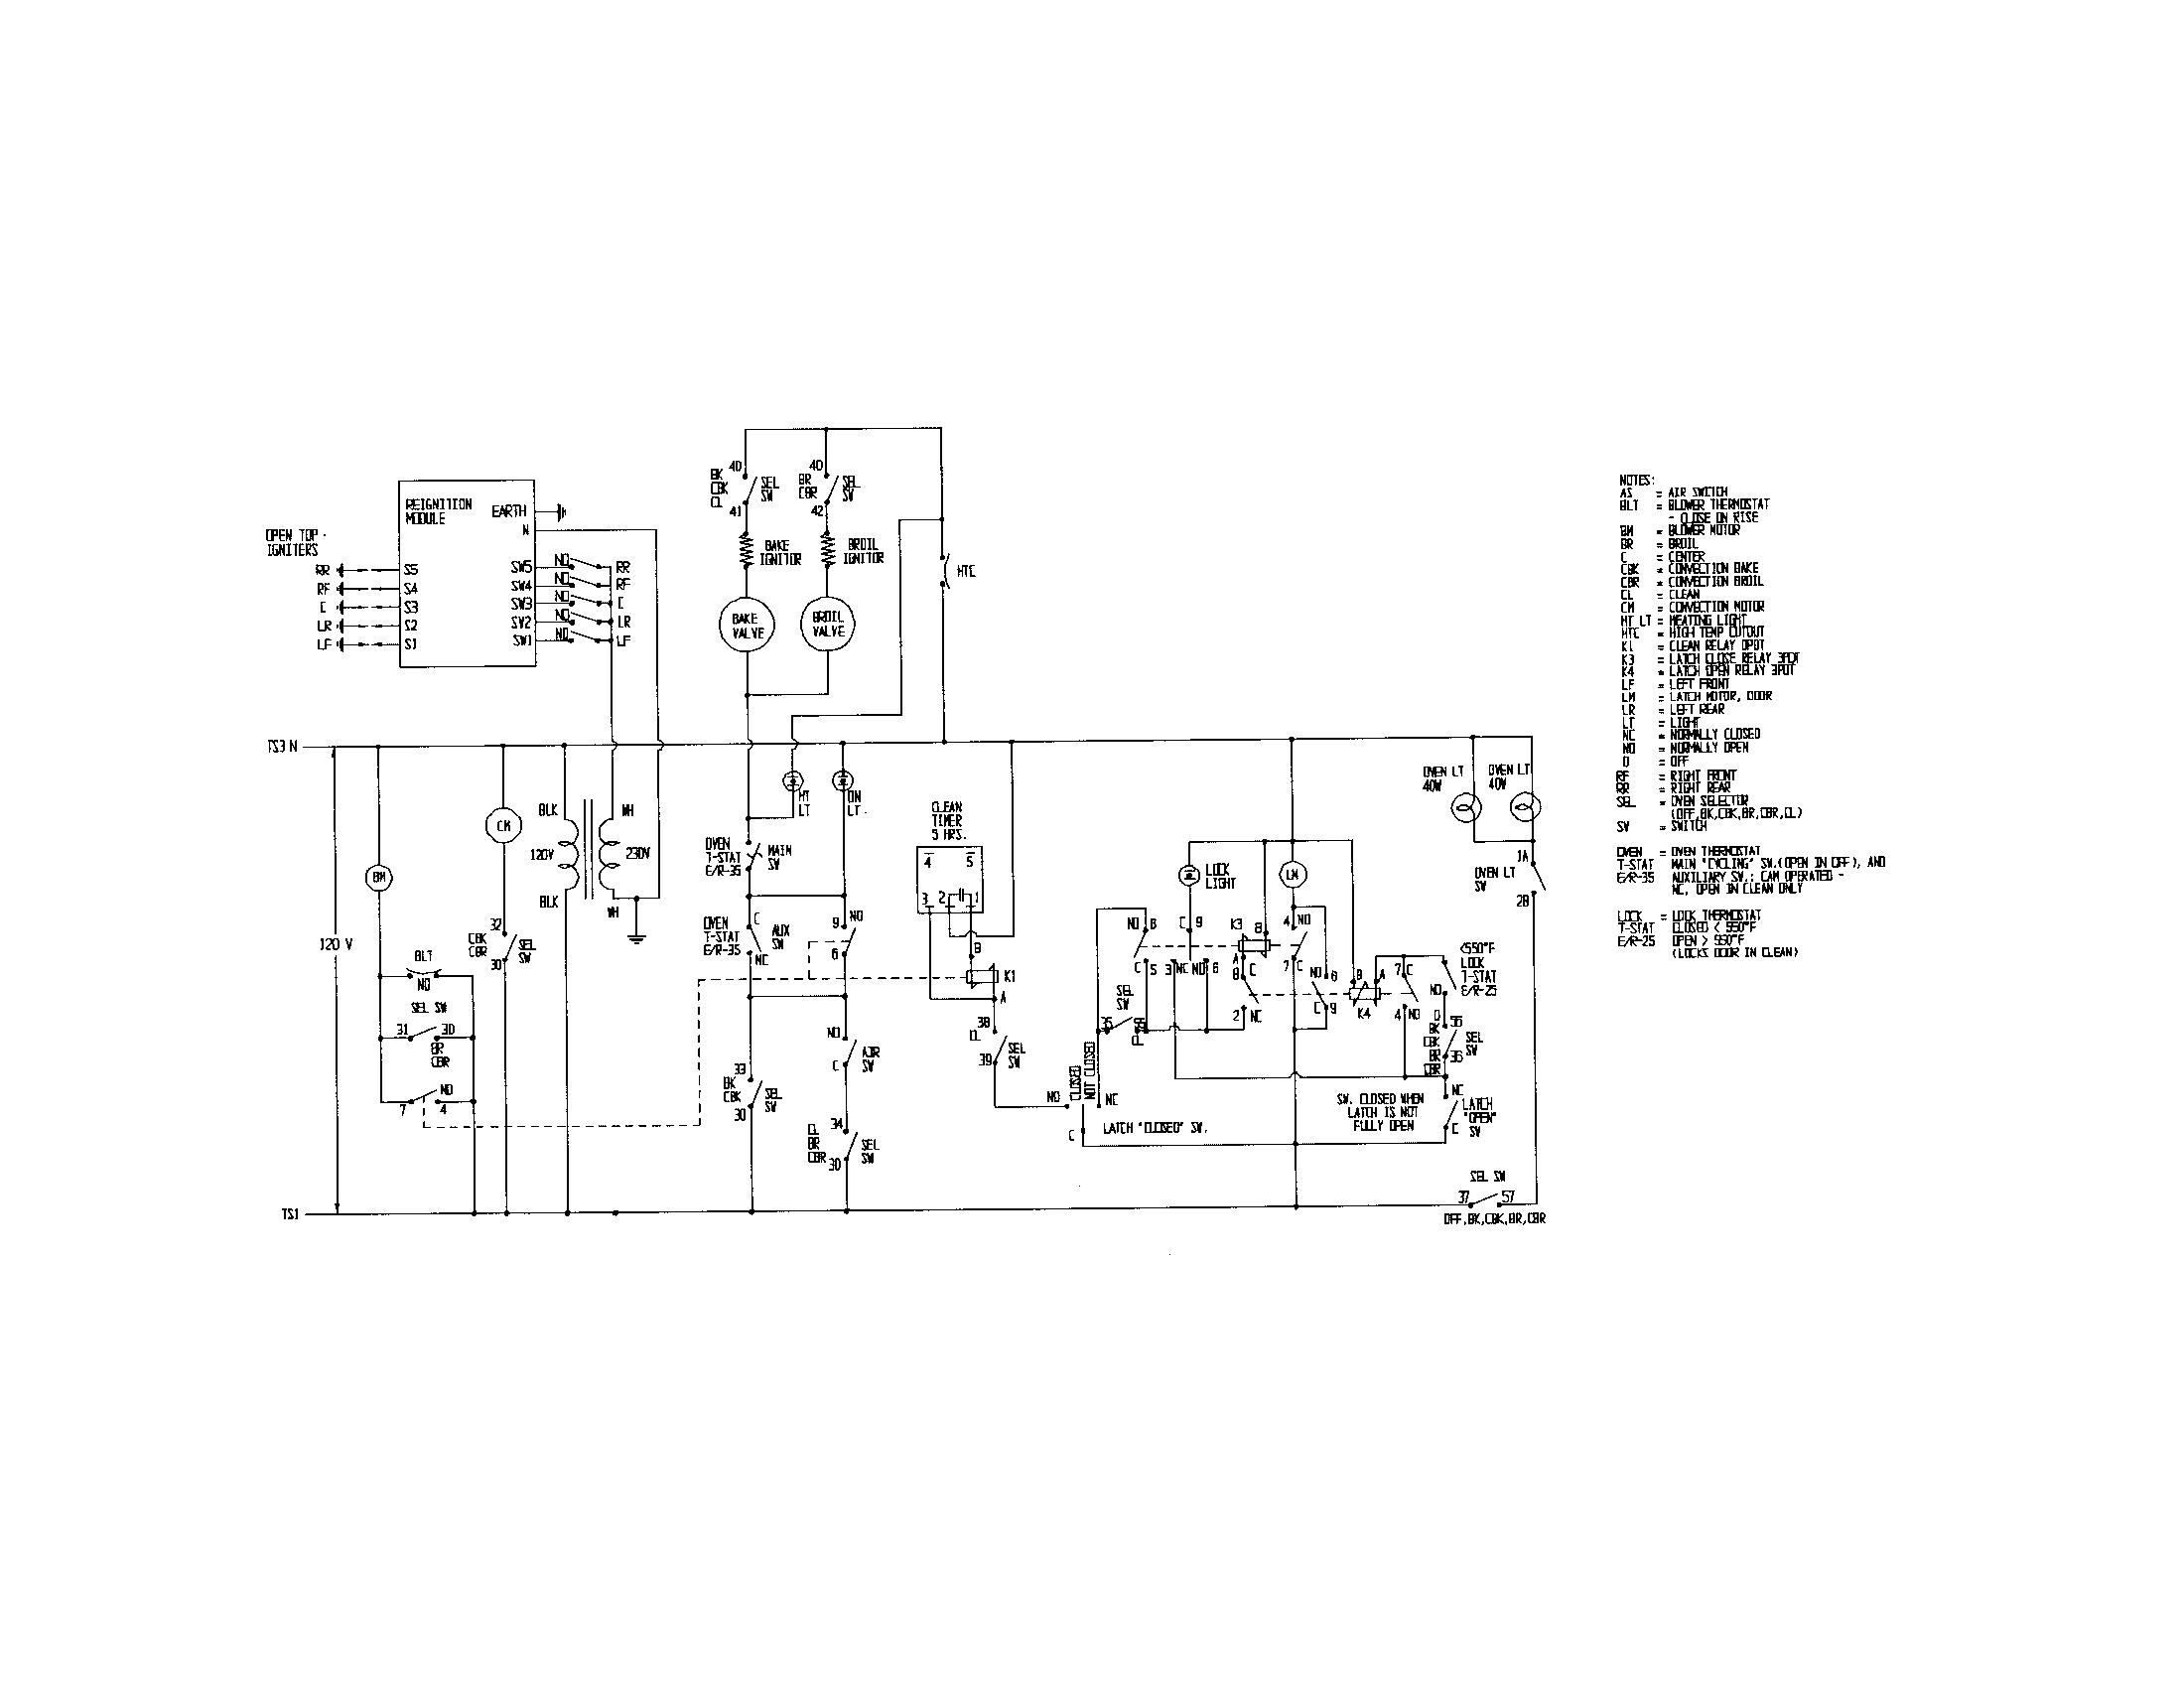 Dact Wiring Diagram Rs-232 Wiring Diagram Wiring Diagram